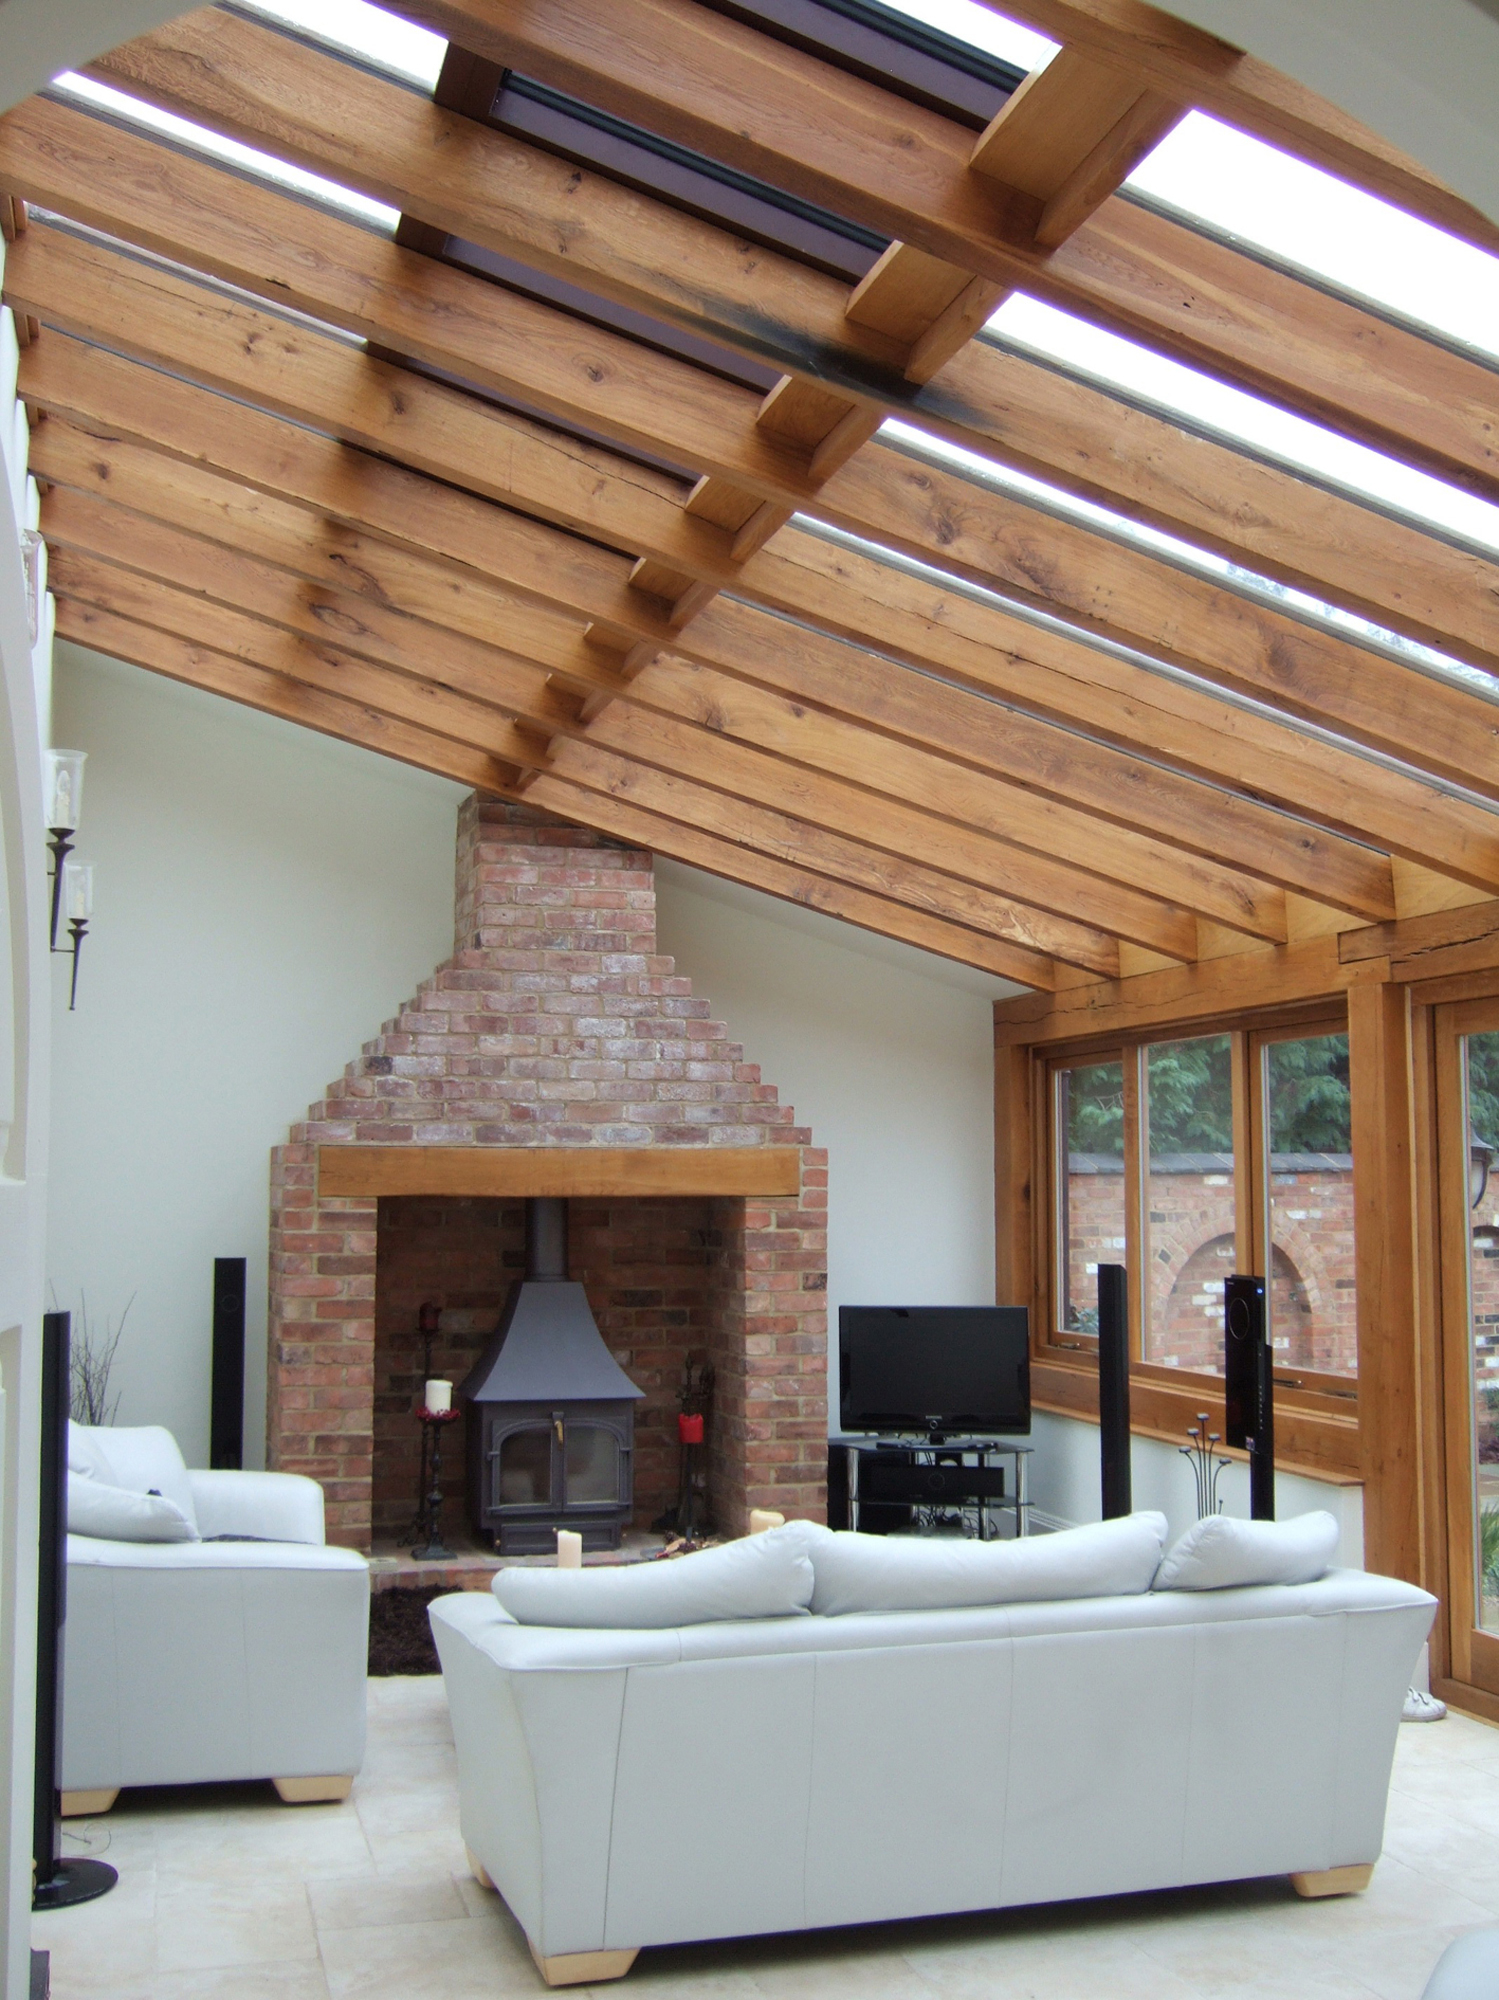 Property development by Shiel Developments in Northamptonshire